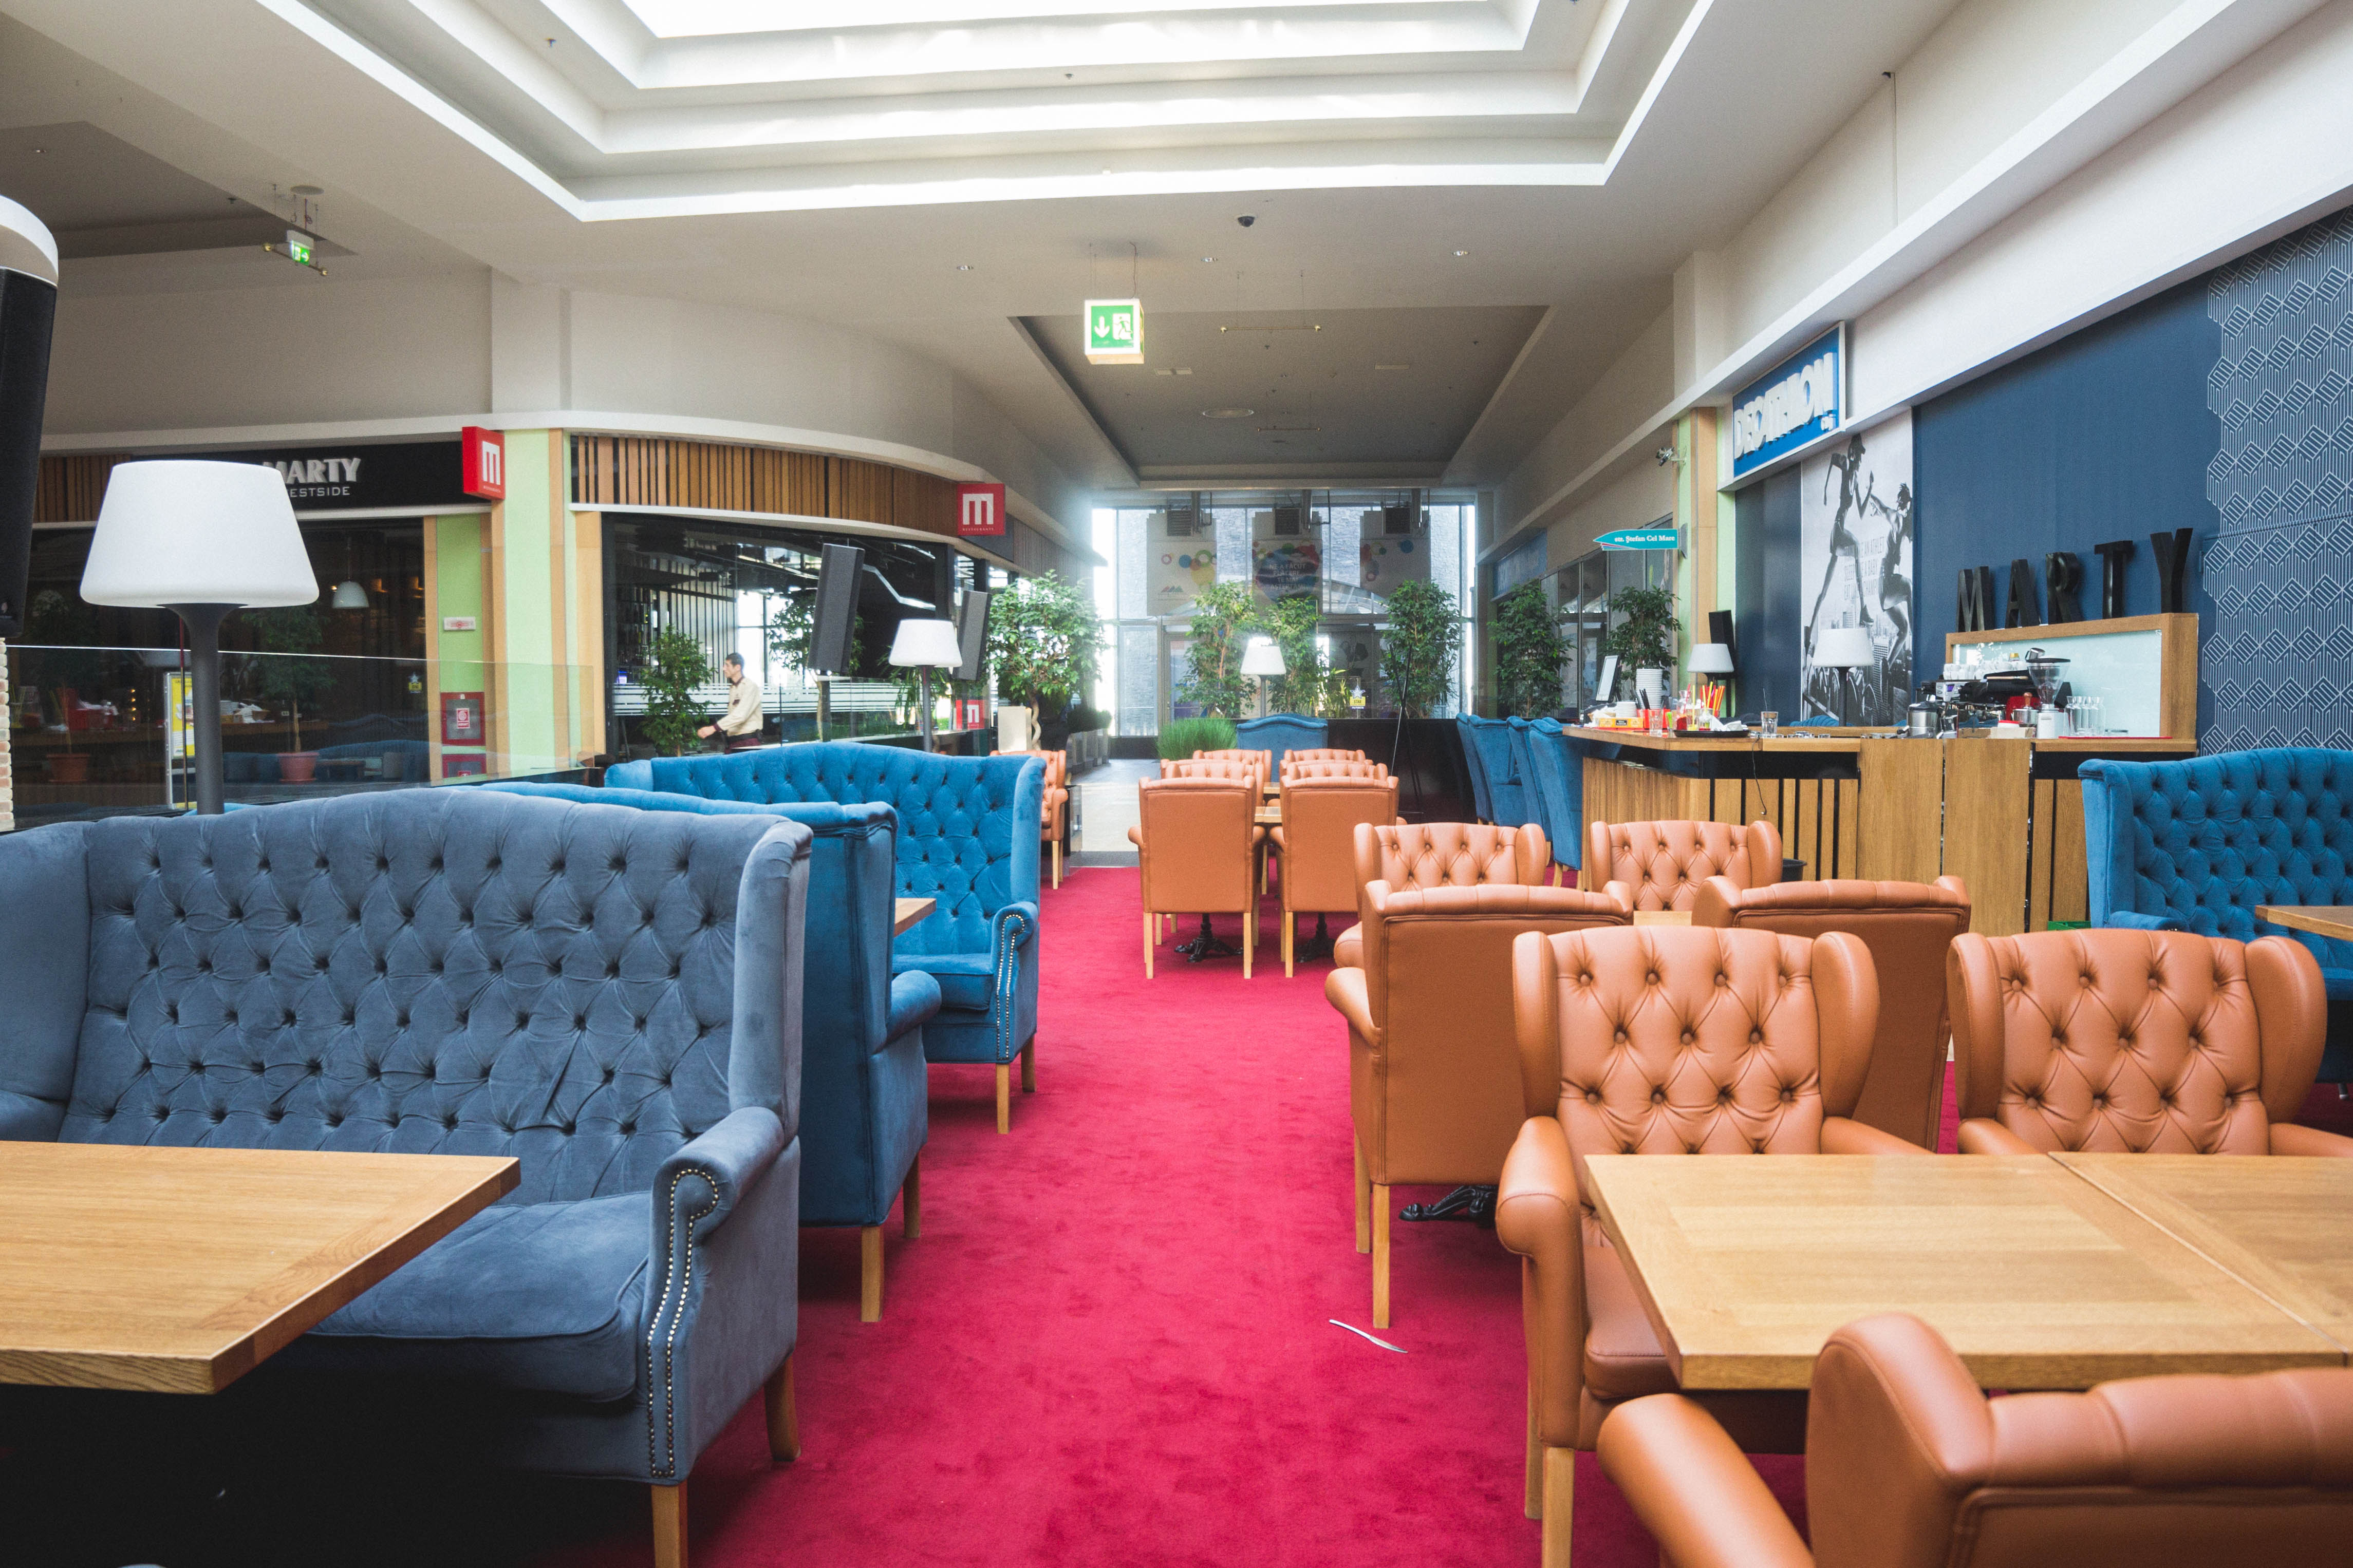 cafenea-marty-west-side-polus-center-cluj-napoca-3